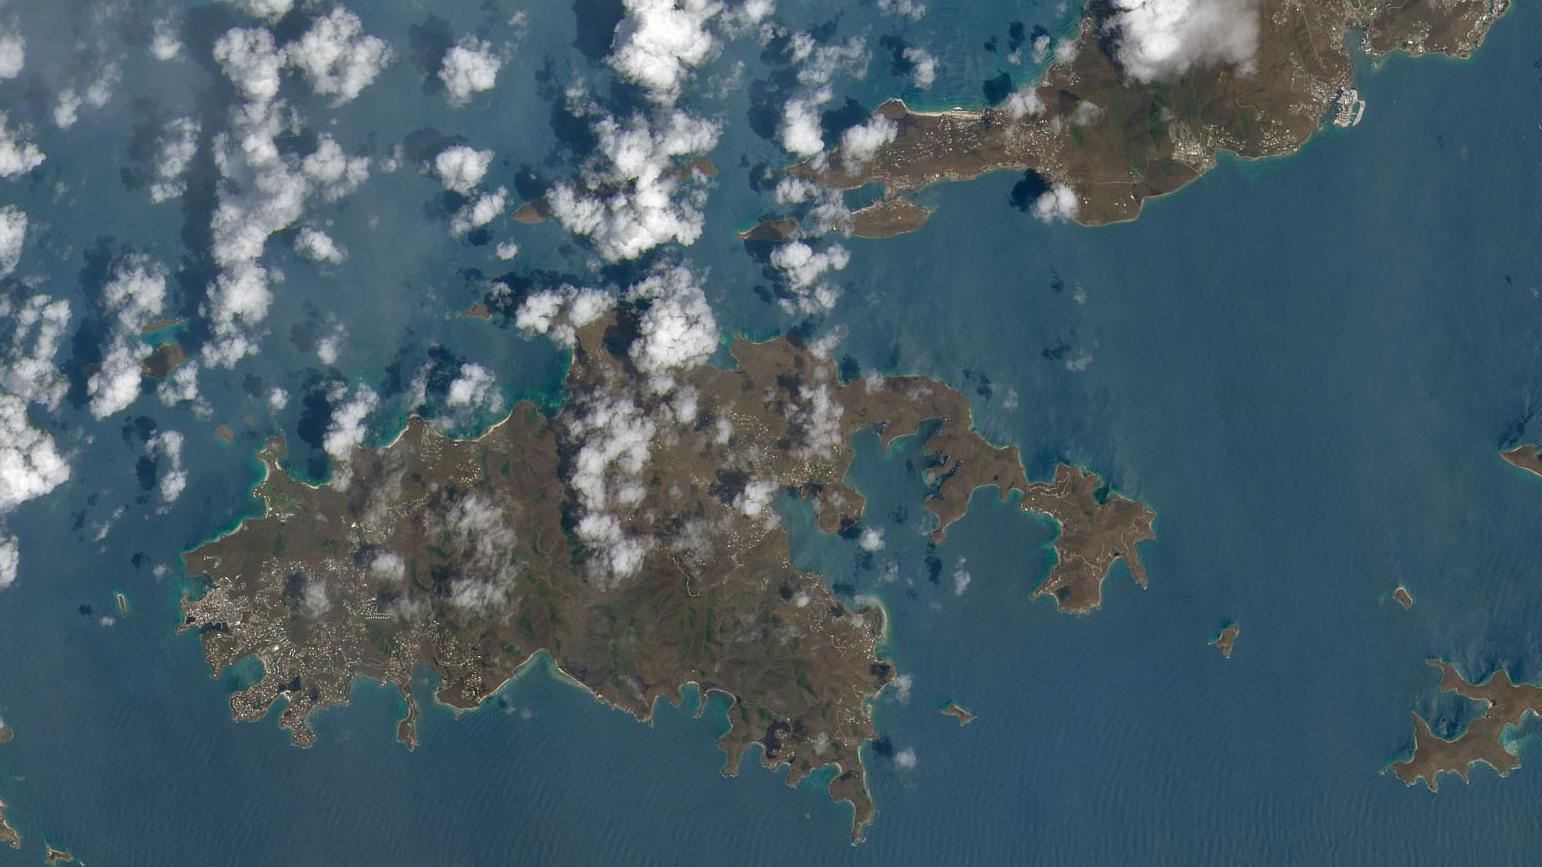 NASA Satellite Images Show How Hurricane Irma Devastated The Caribbean